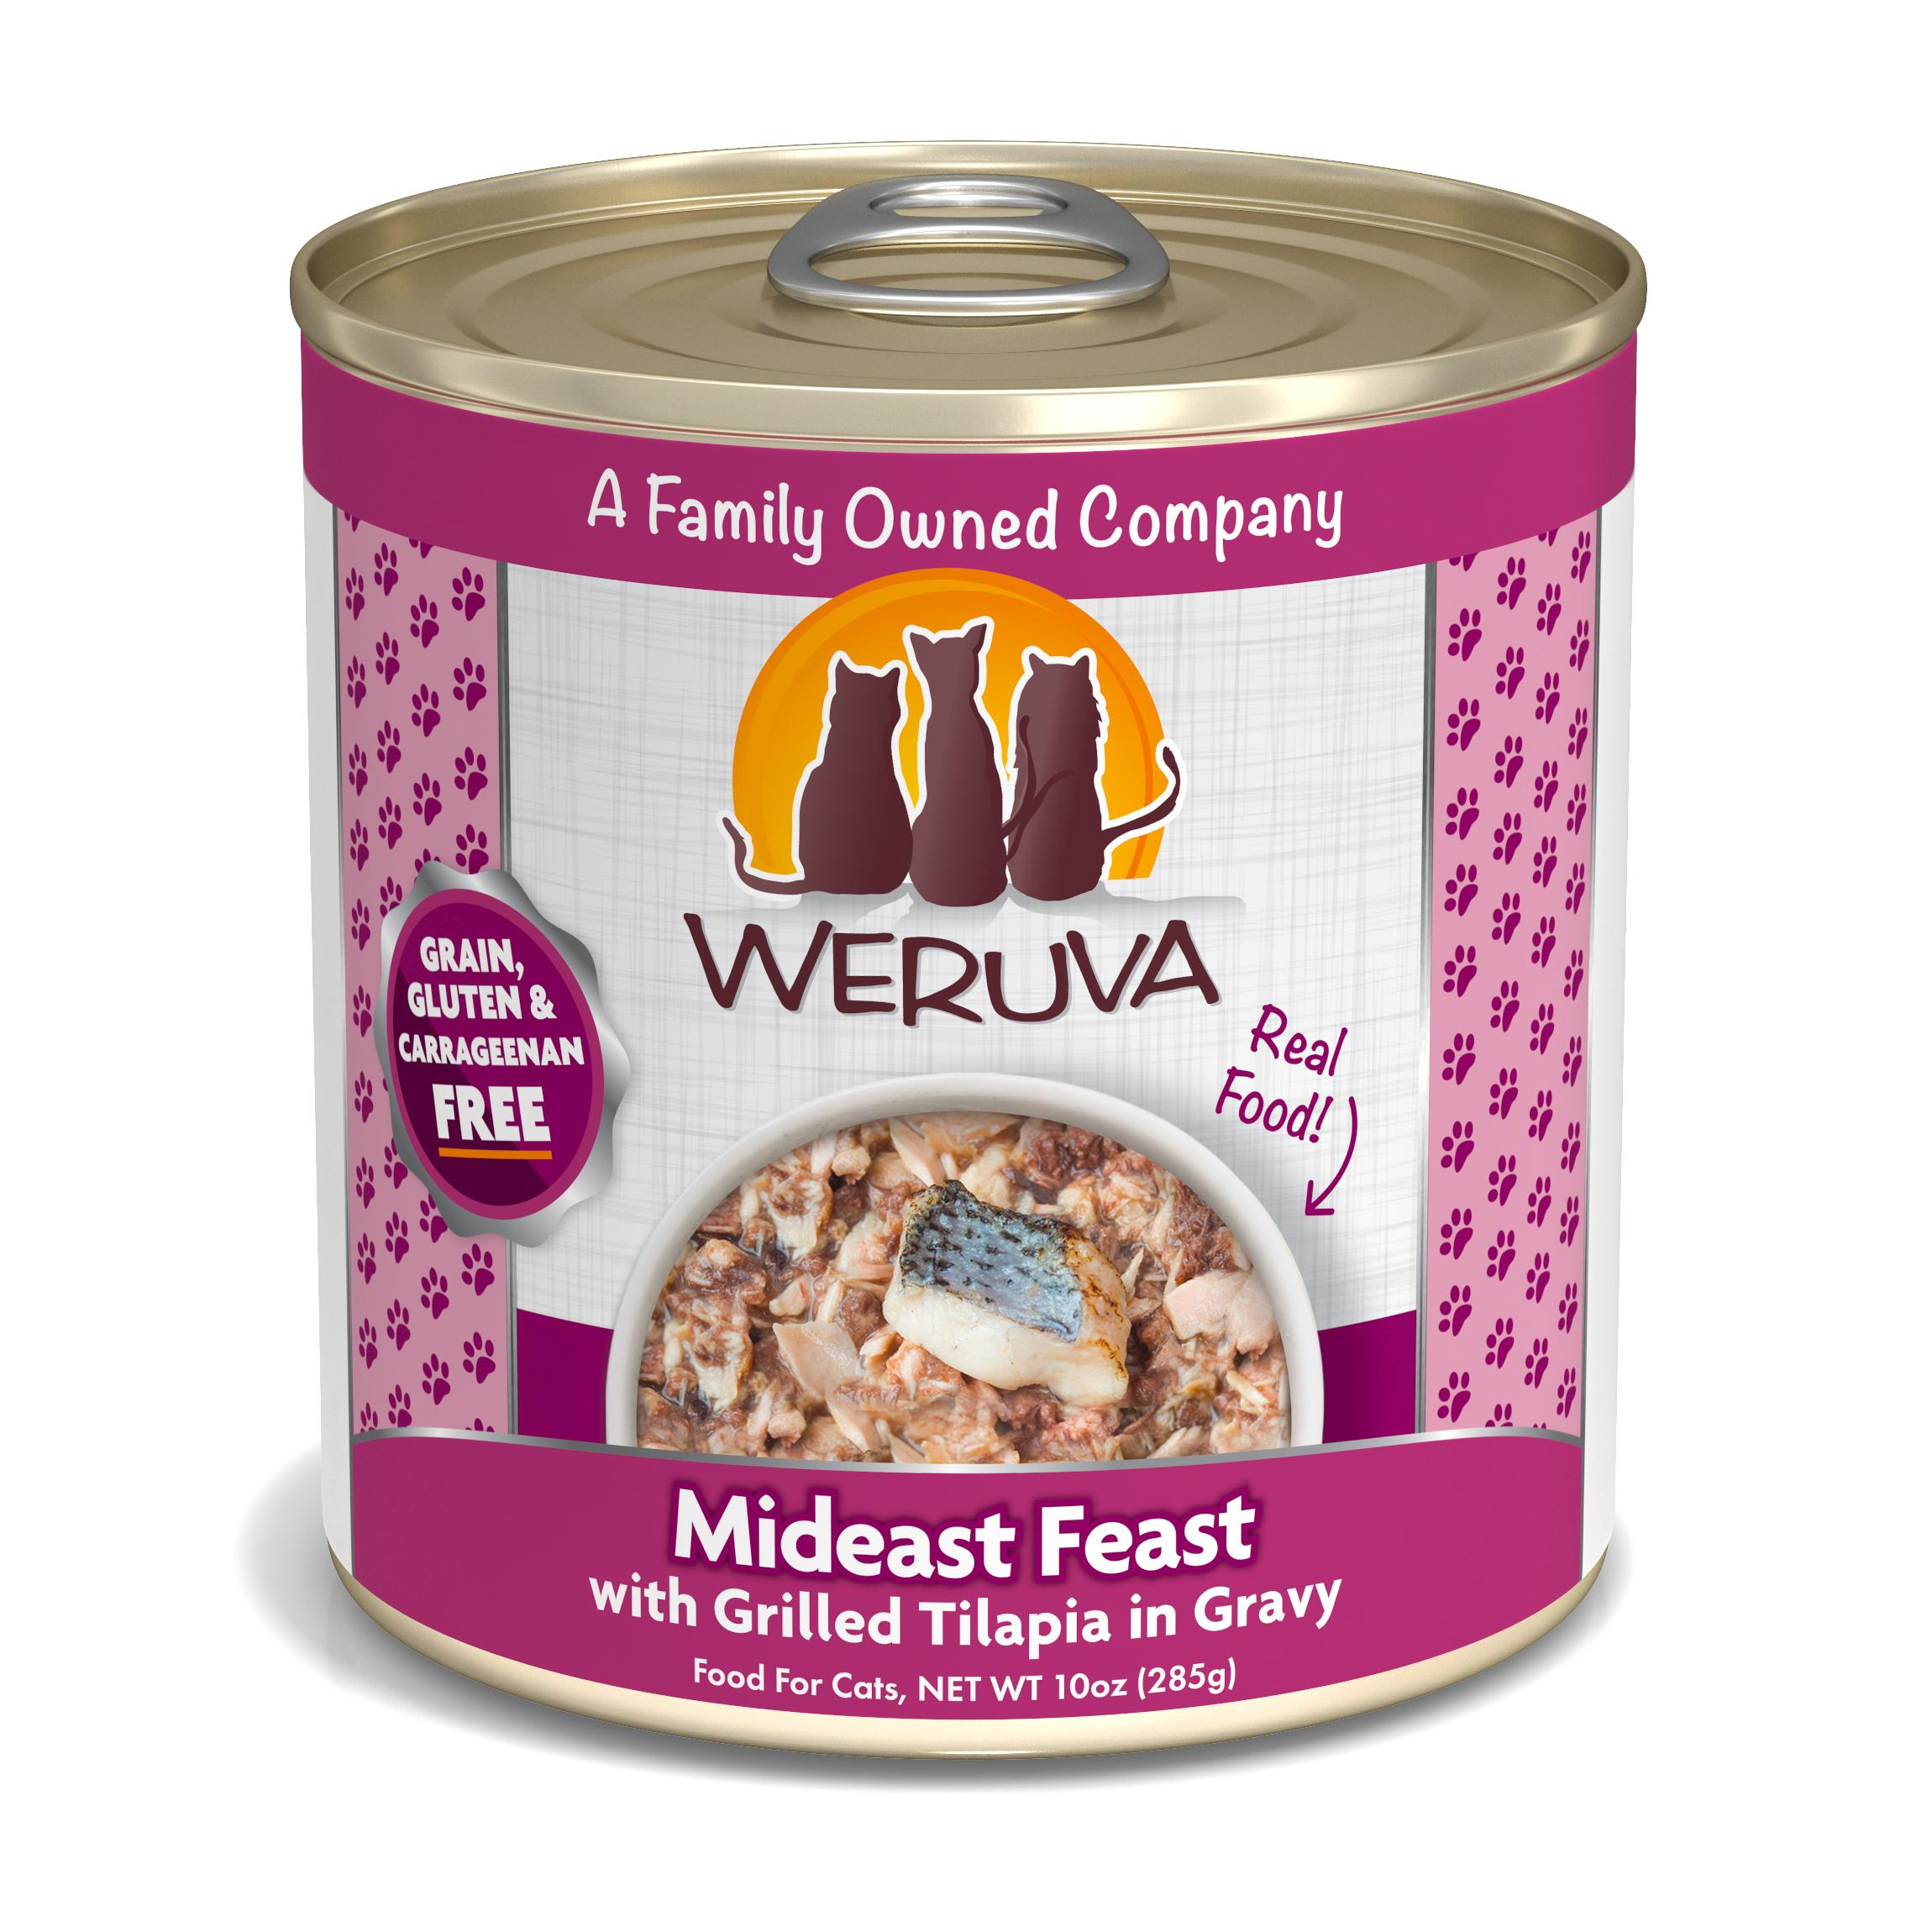 Weruva Cat Classic Mideast Feast with Grilled Tilapia in Gravy Grain-Free Wet Cat Food, 10-oz